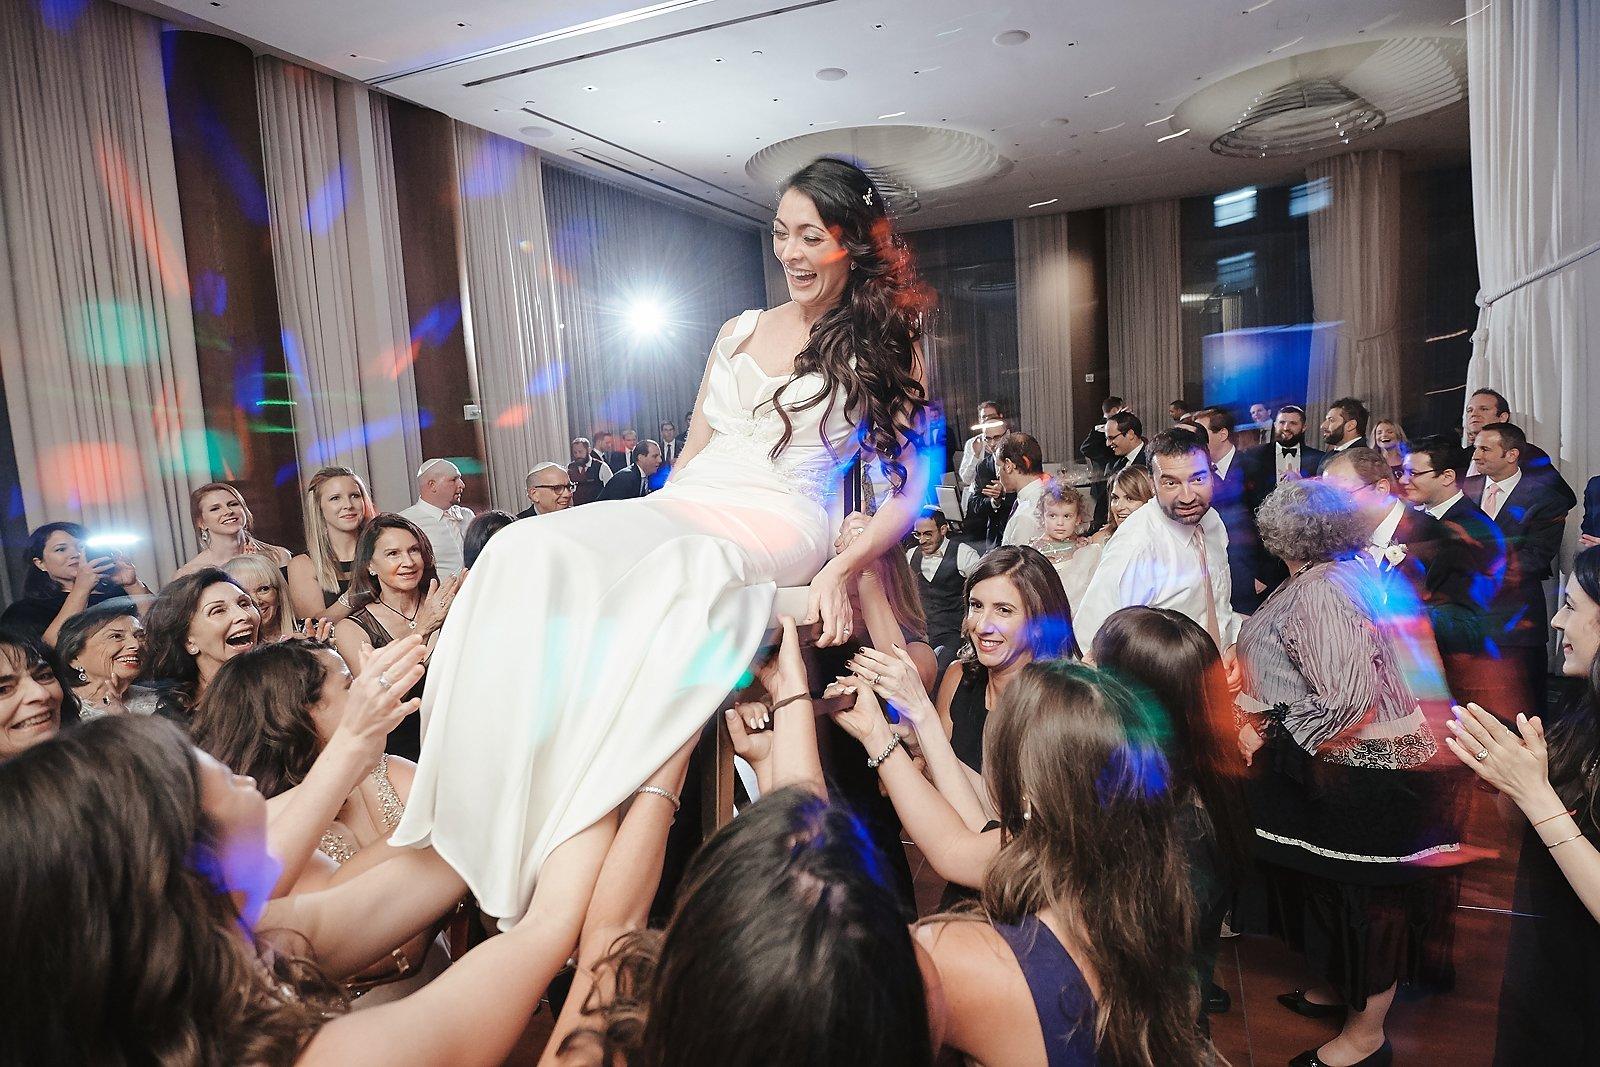 kimpton eventi hotel wedding new york city